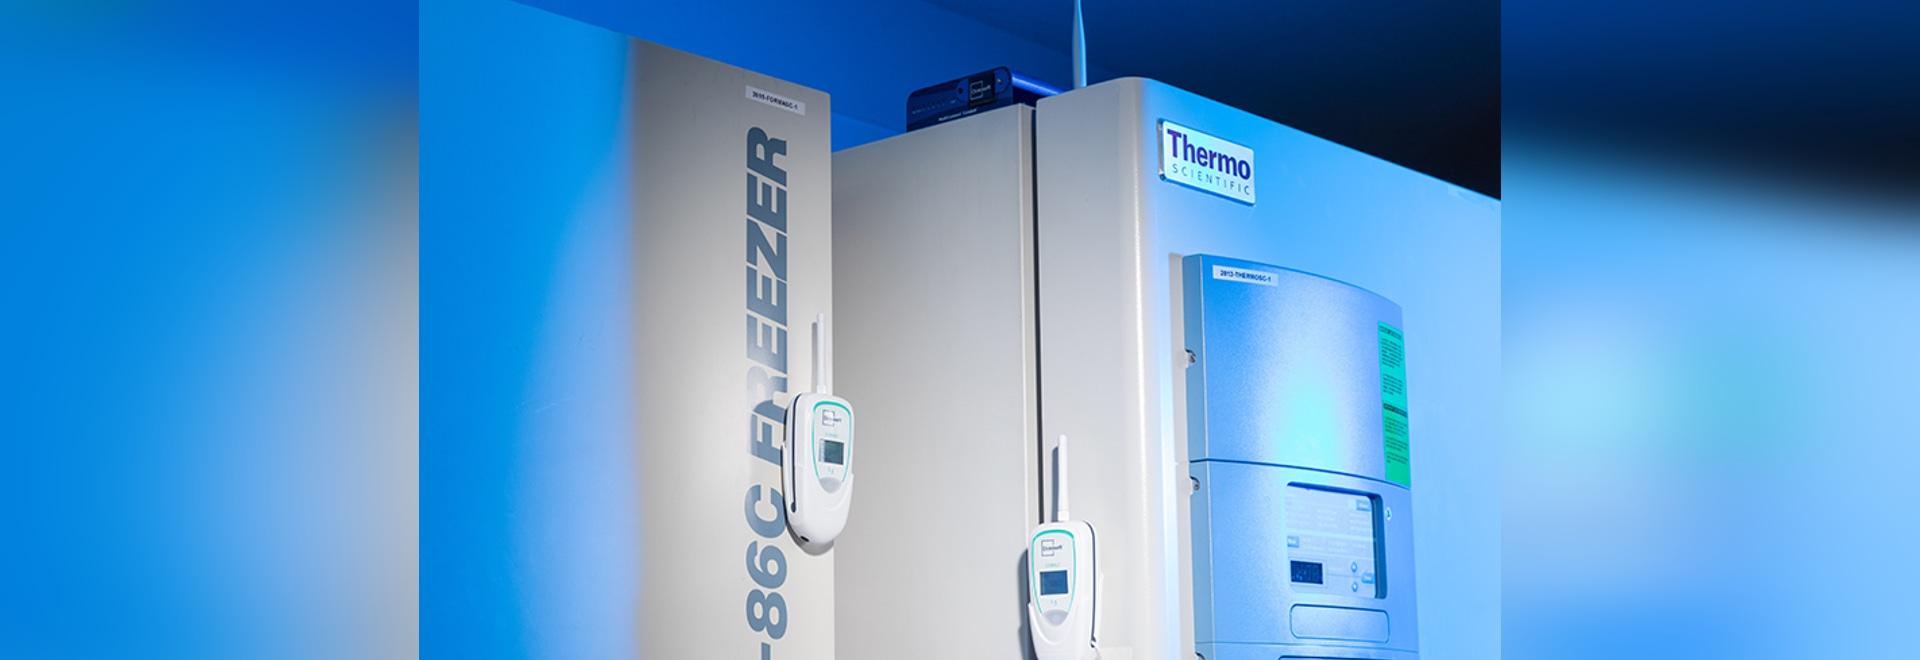 OCEASOFT Cobalt L3 monitoring a freezer in a laboratory